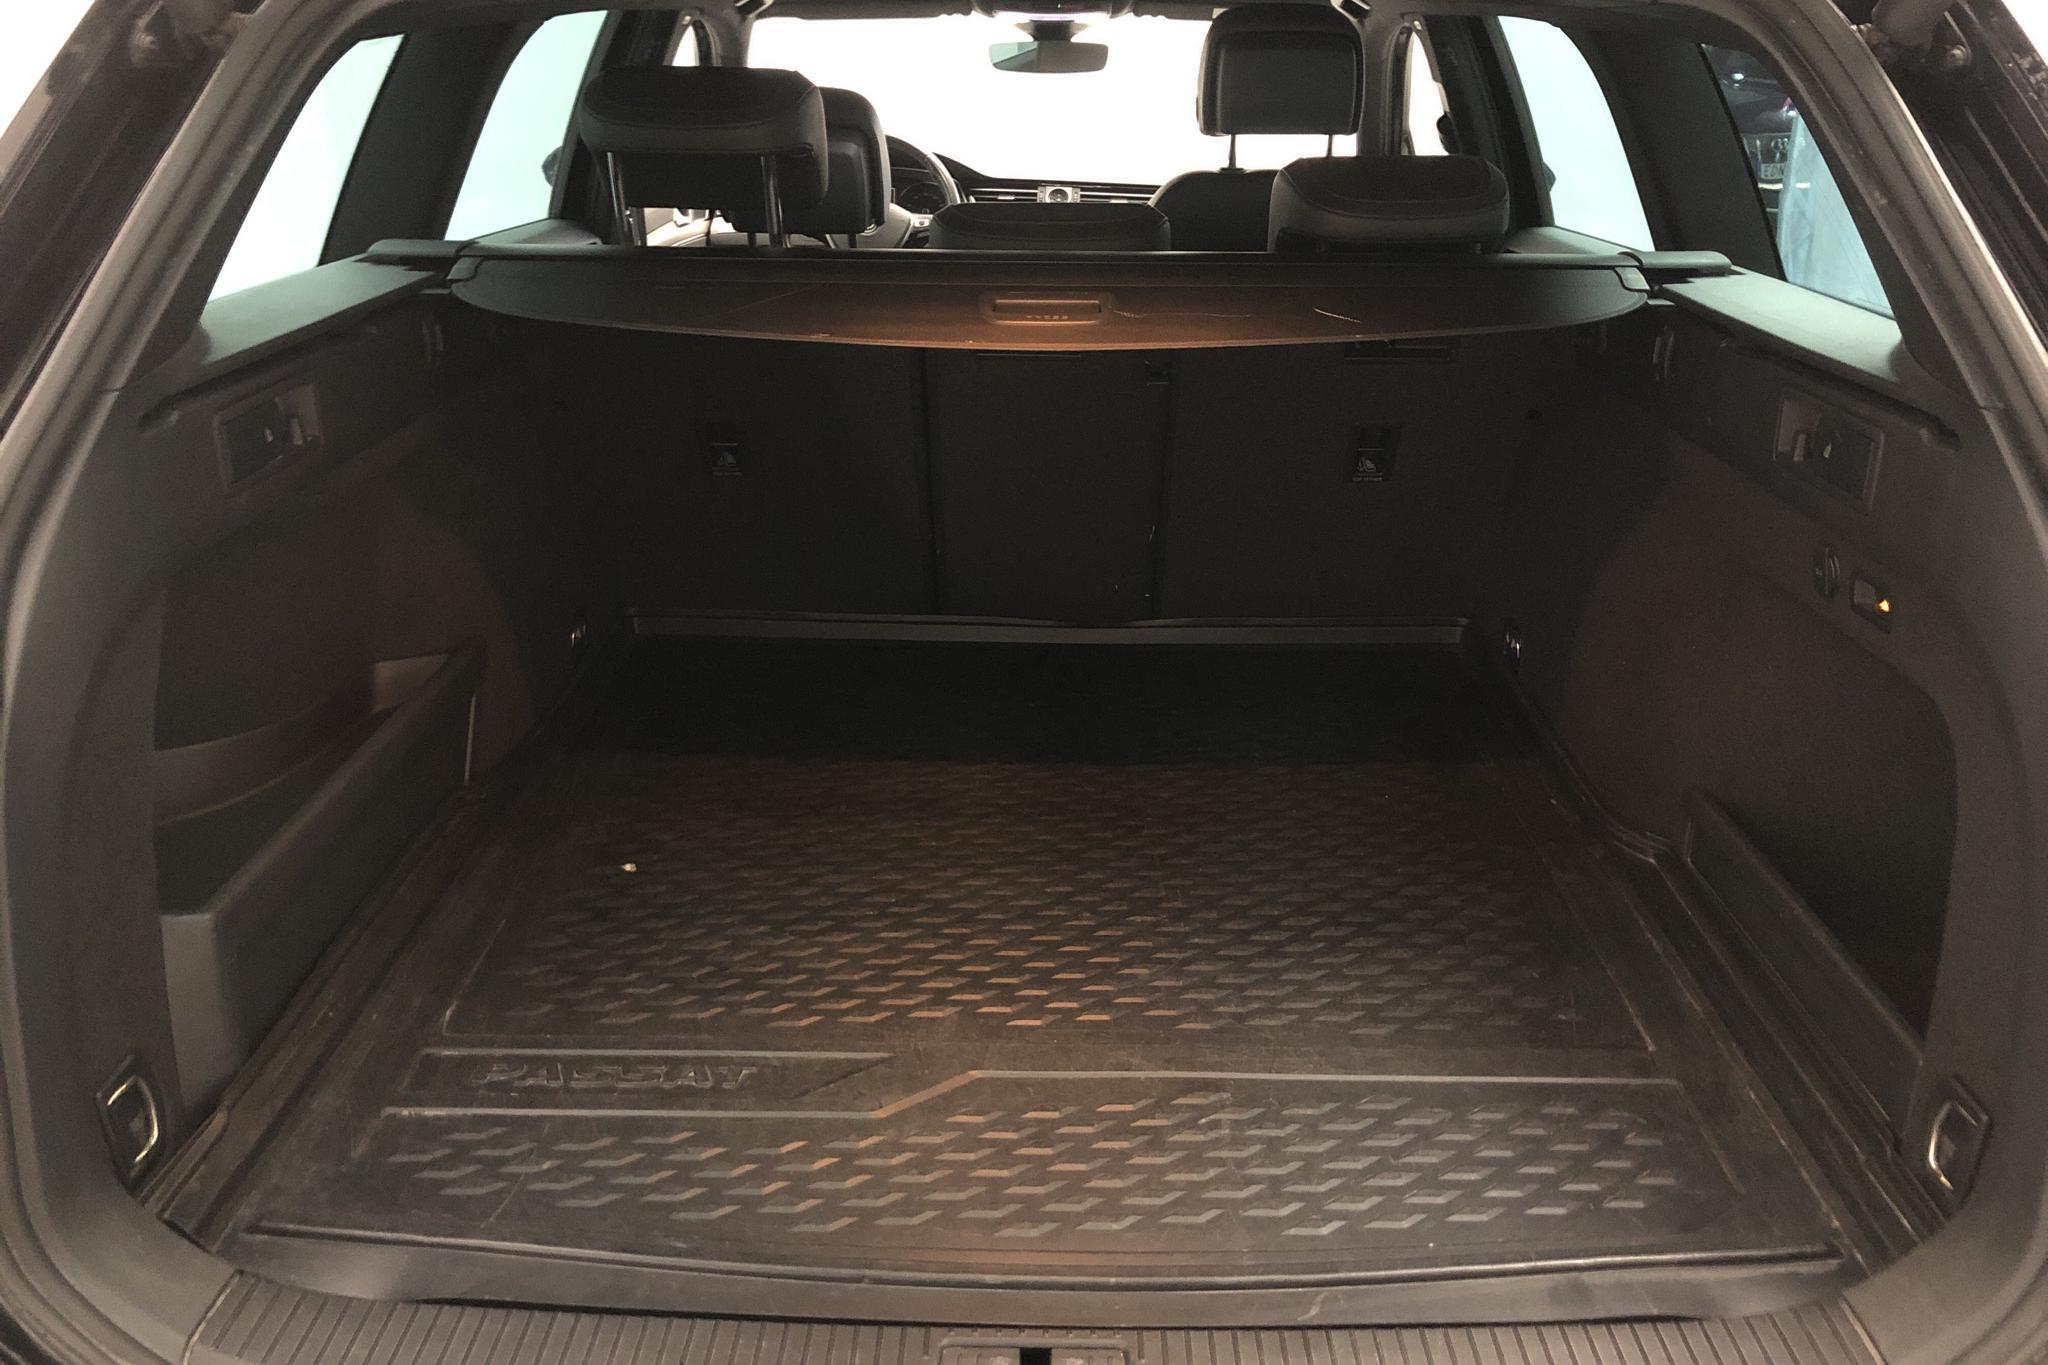 VW Passat 1.4 Plug-in-Hybrid Sportscombi (218hk) - 123 820 km - Automatic - black - 2017